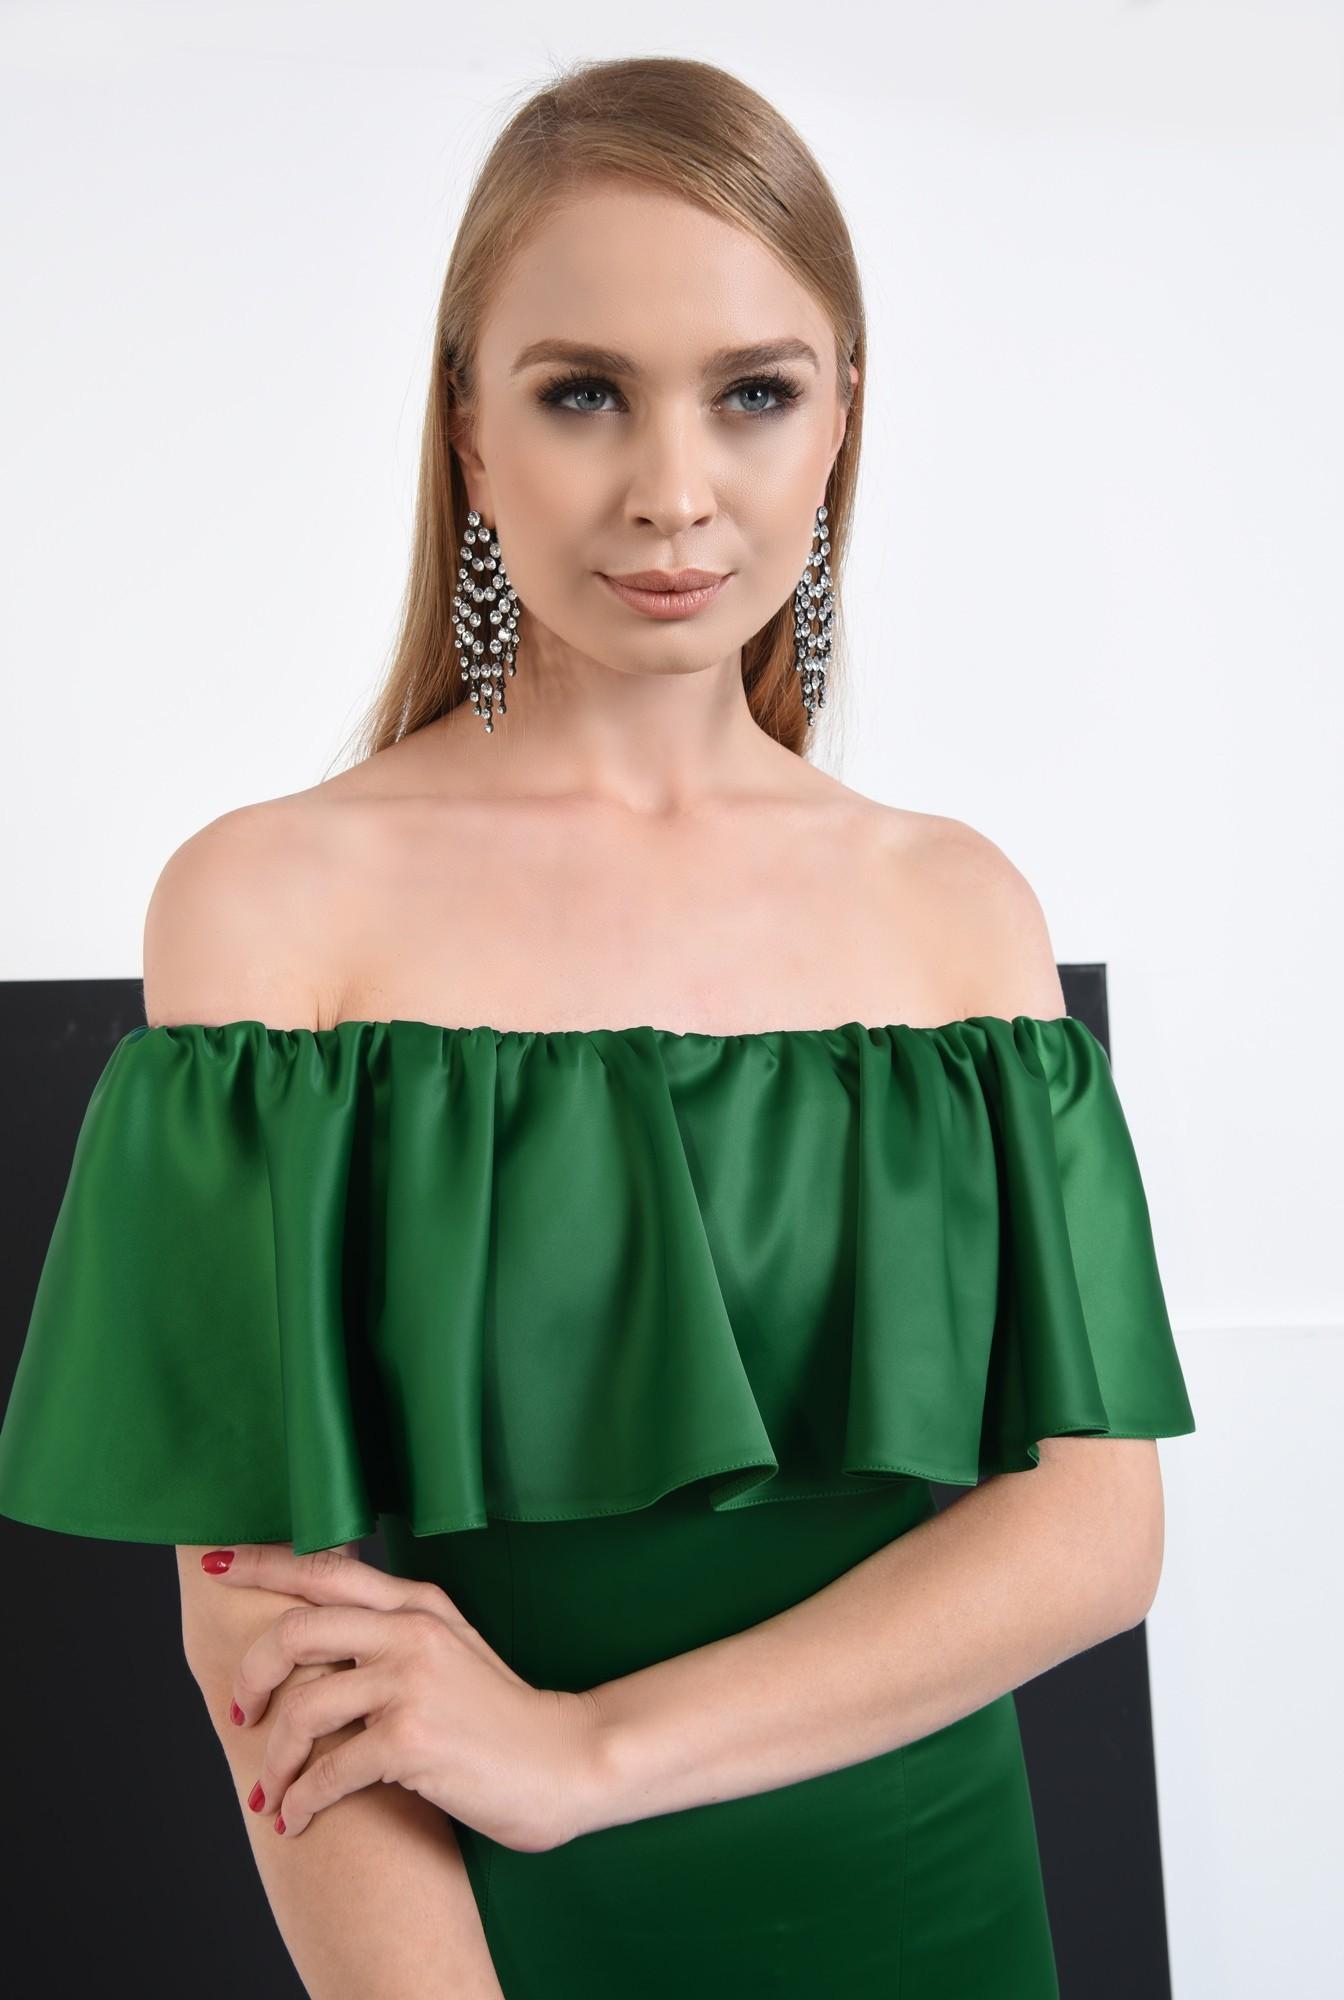 1 - rochie de seara smarald, slit adanc, umeri dezgoliti, maxi